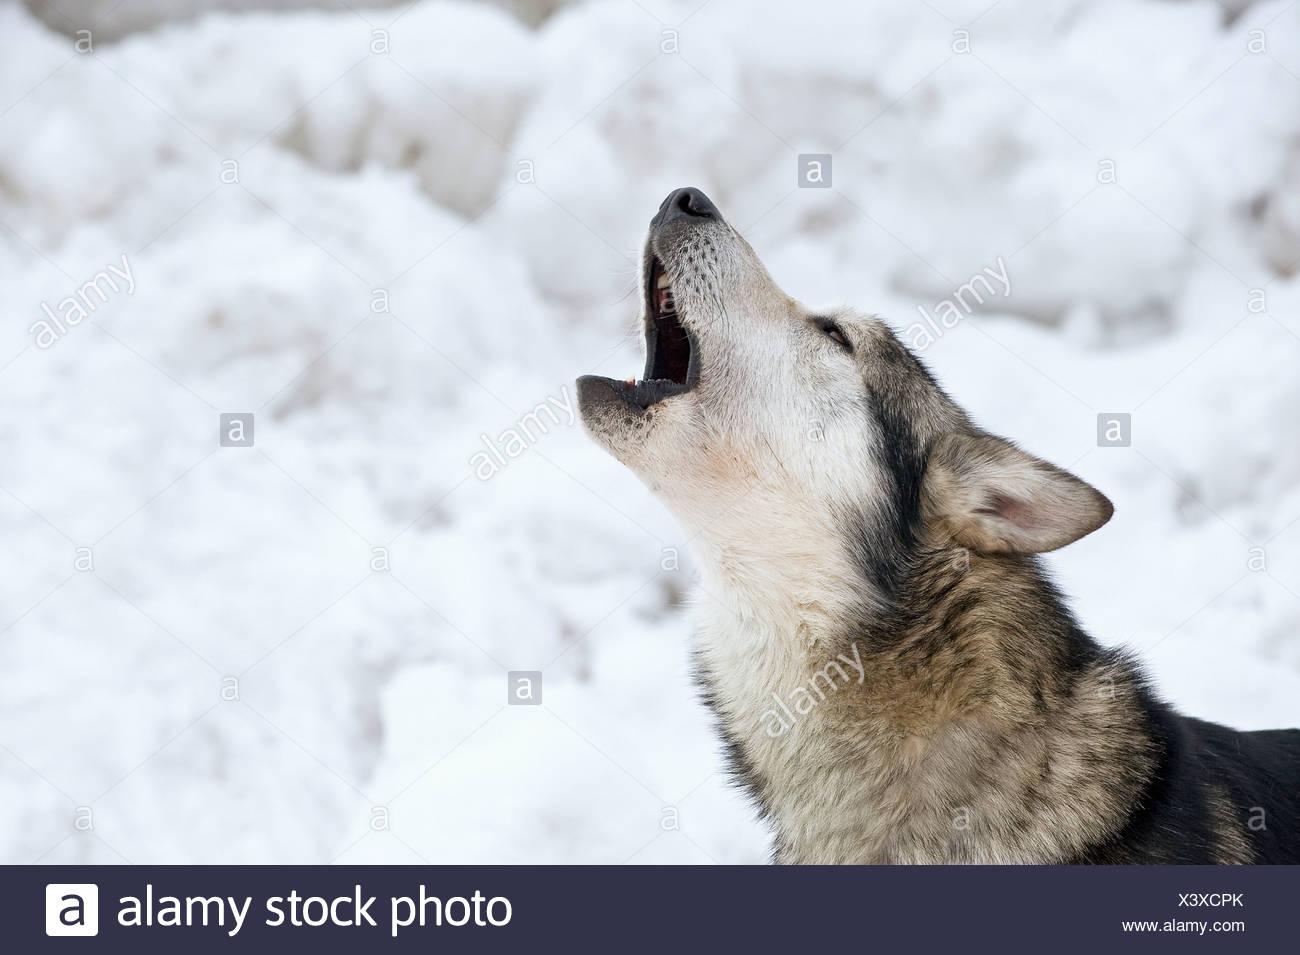 Siberian Husky Howling Stock Photos Siberian Husky Howling Stock